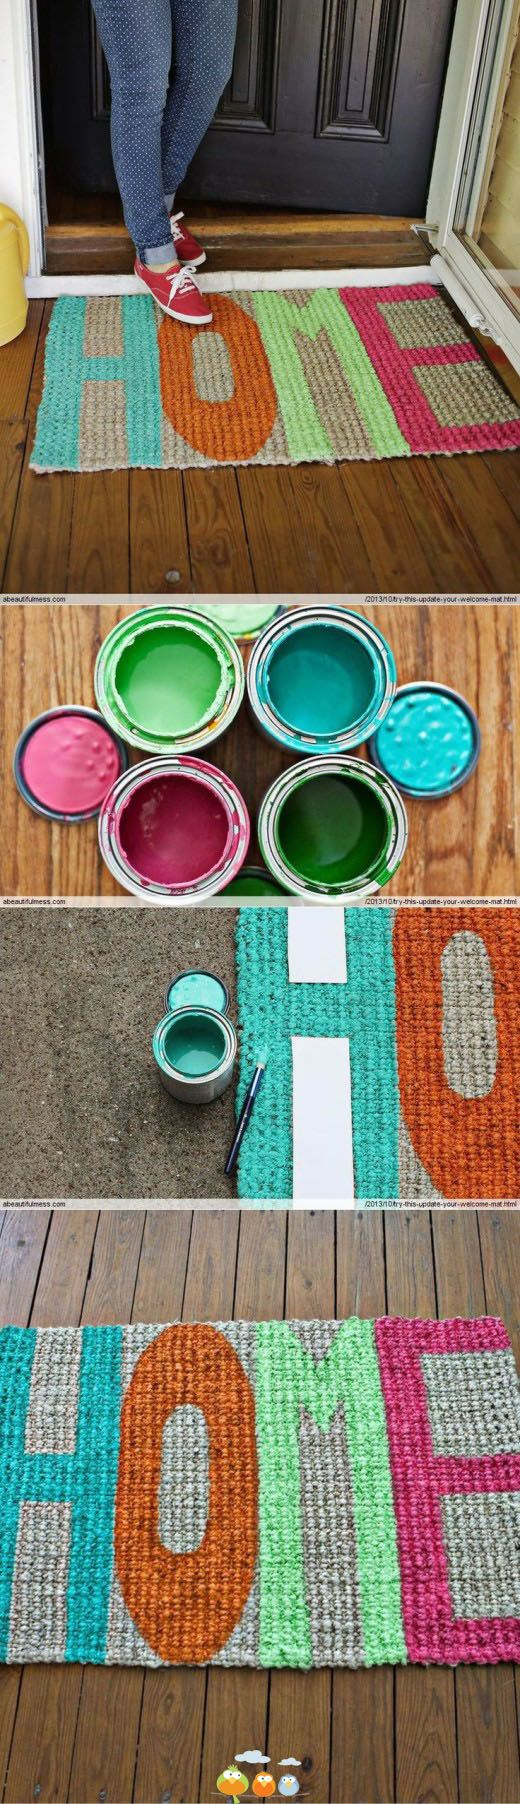 DIY Paint any design on a burlap rug